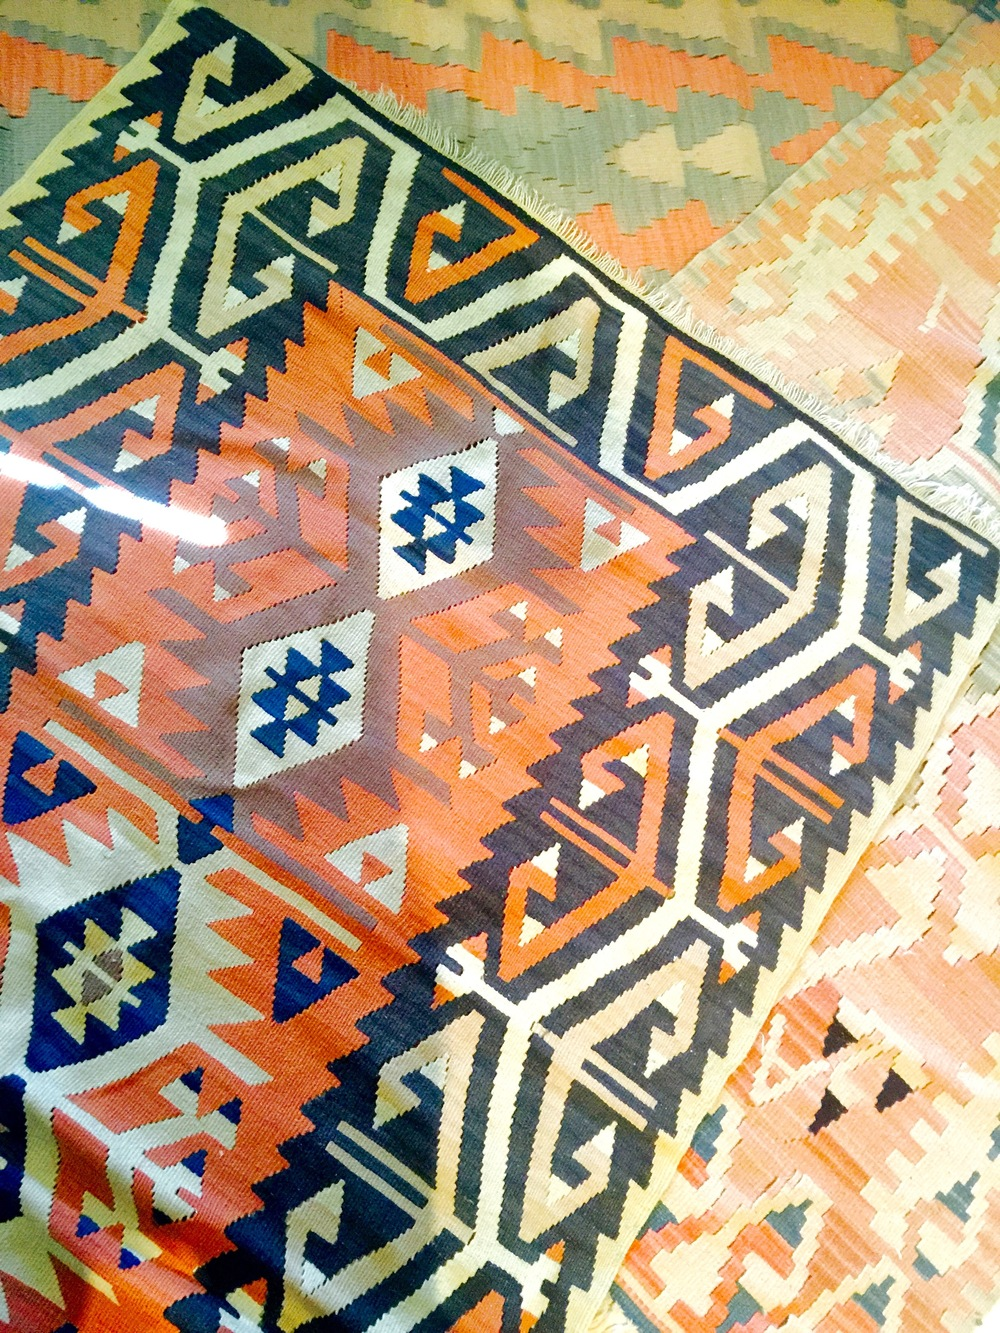 Turkish Kilim rug, Turkey - 3 Days*